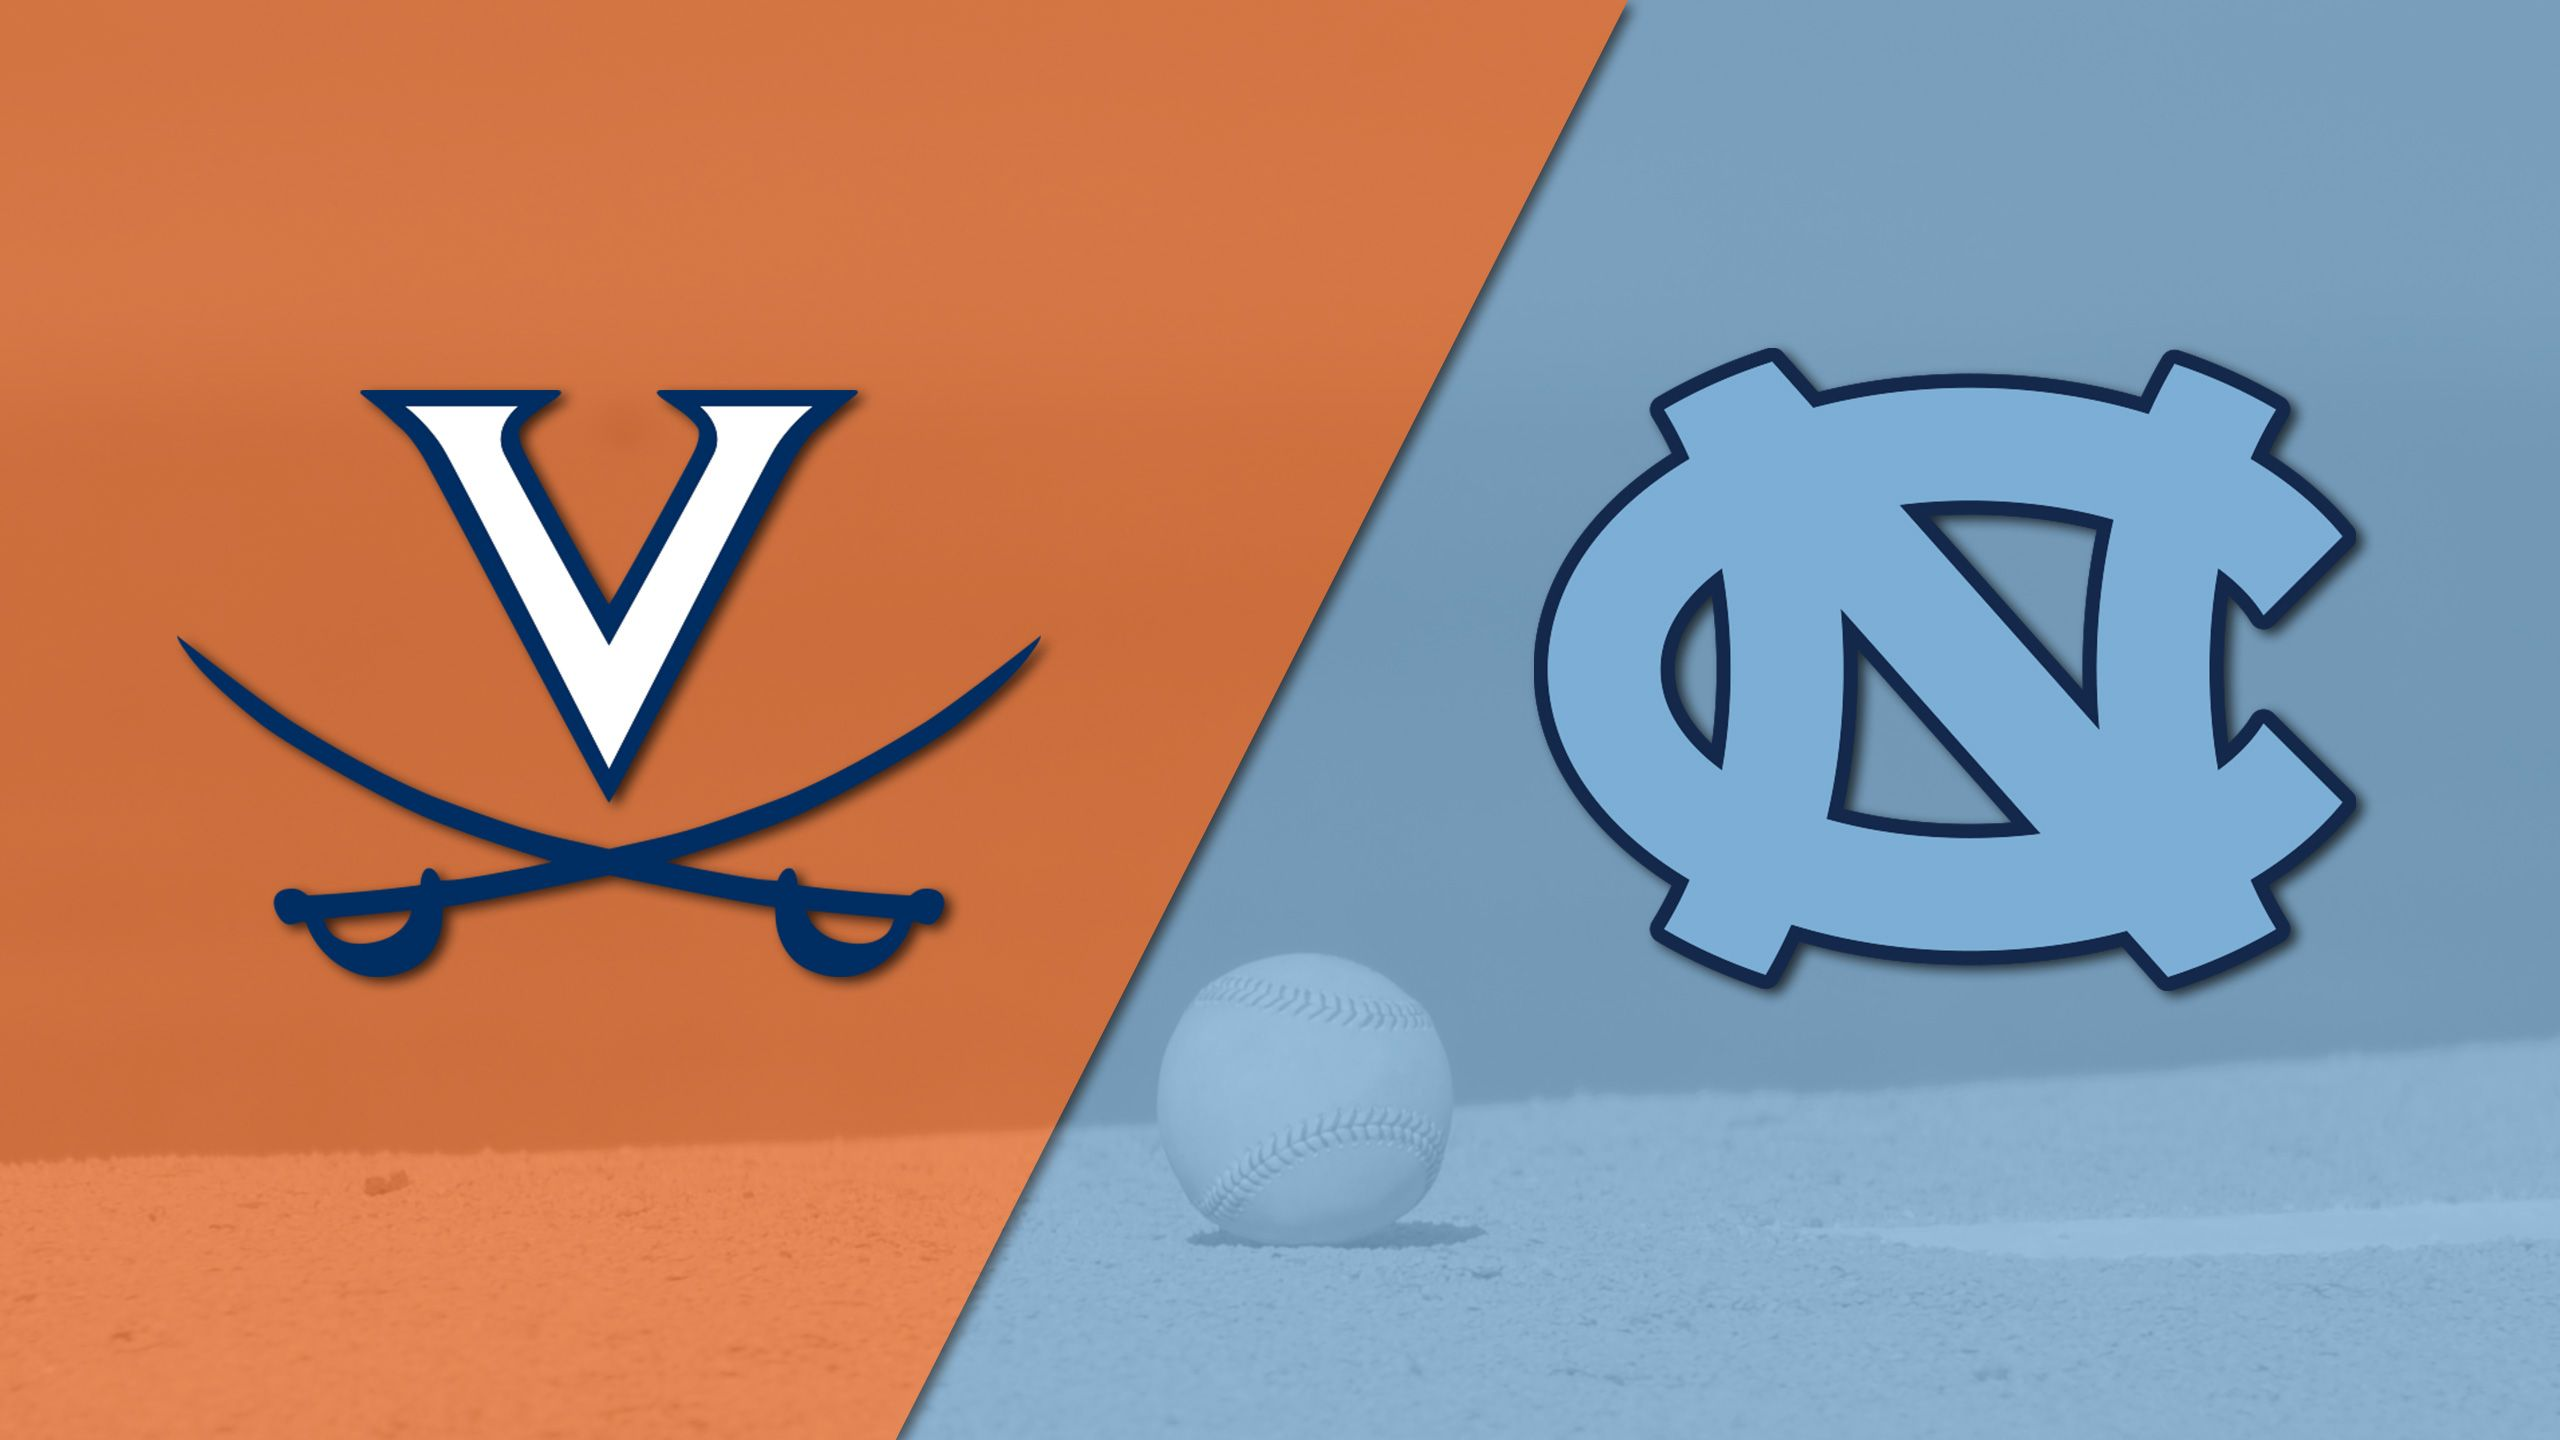 #8 Virginia vs. #10 North Carolina (Baseball)